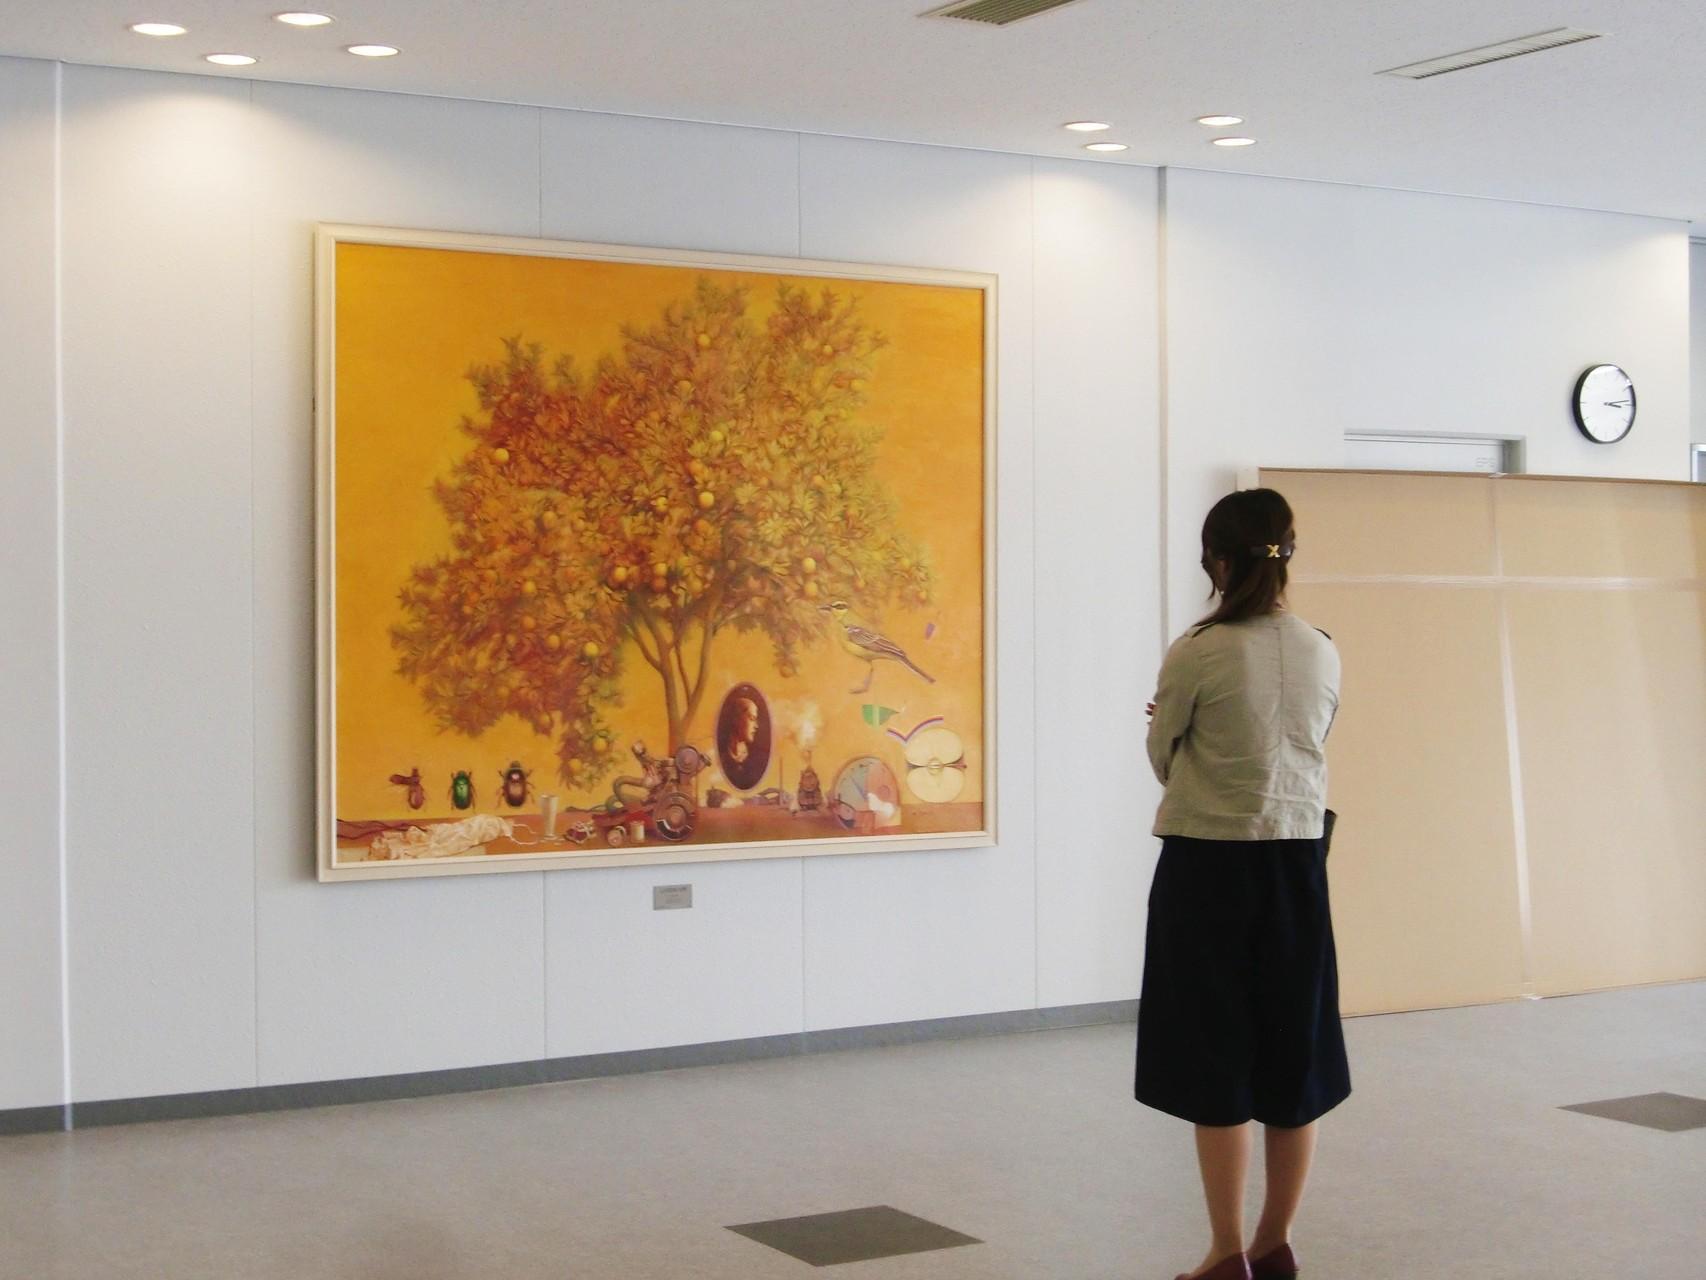 「LANDSCAPE 」150号 227×182cm 油彩 主体展 2009年 木村正恒  主体会員